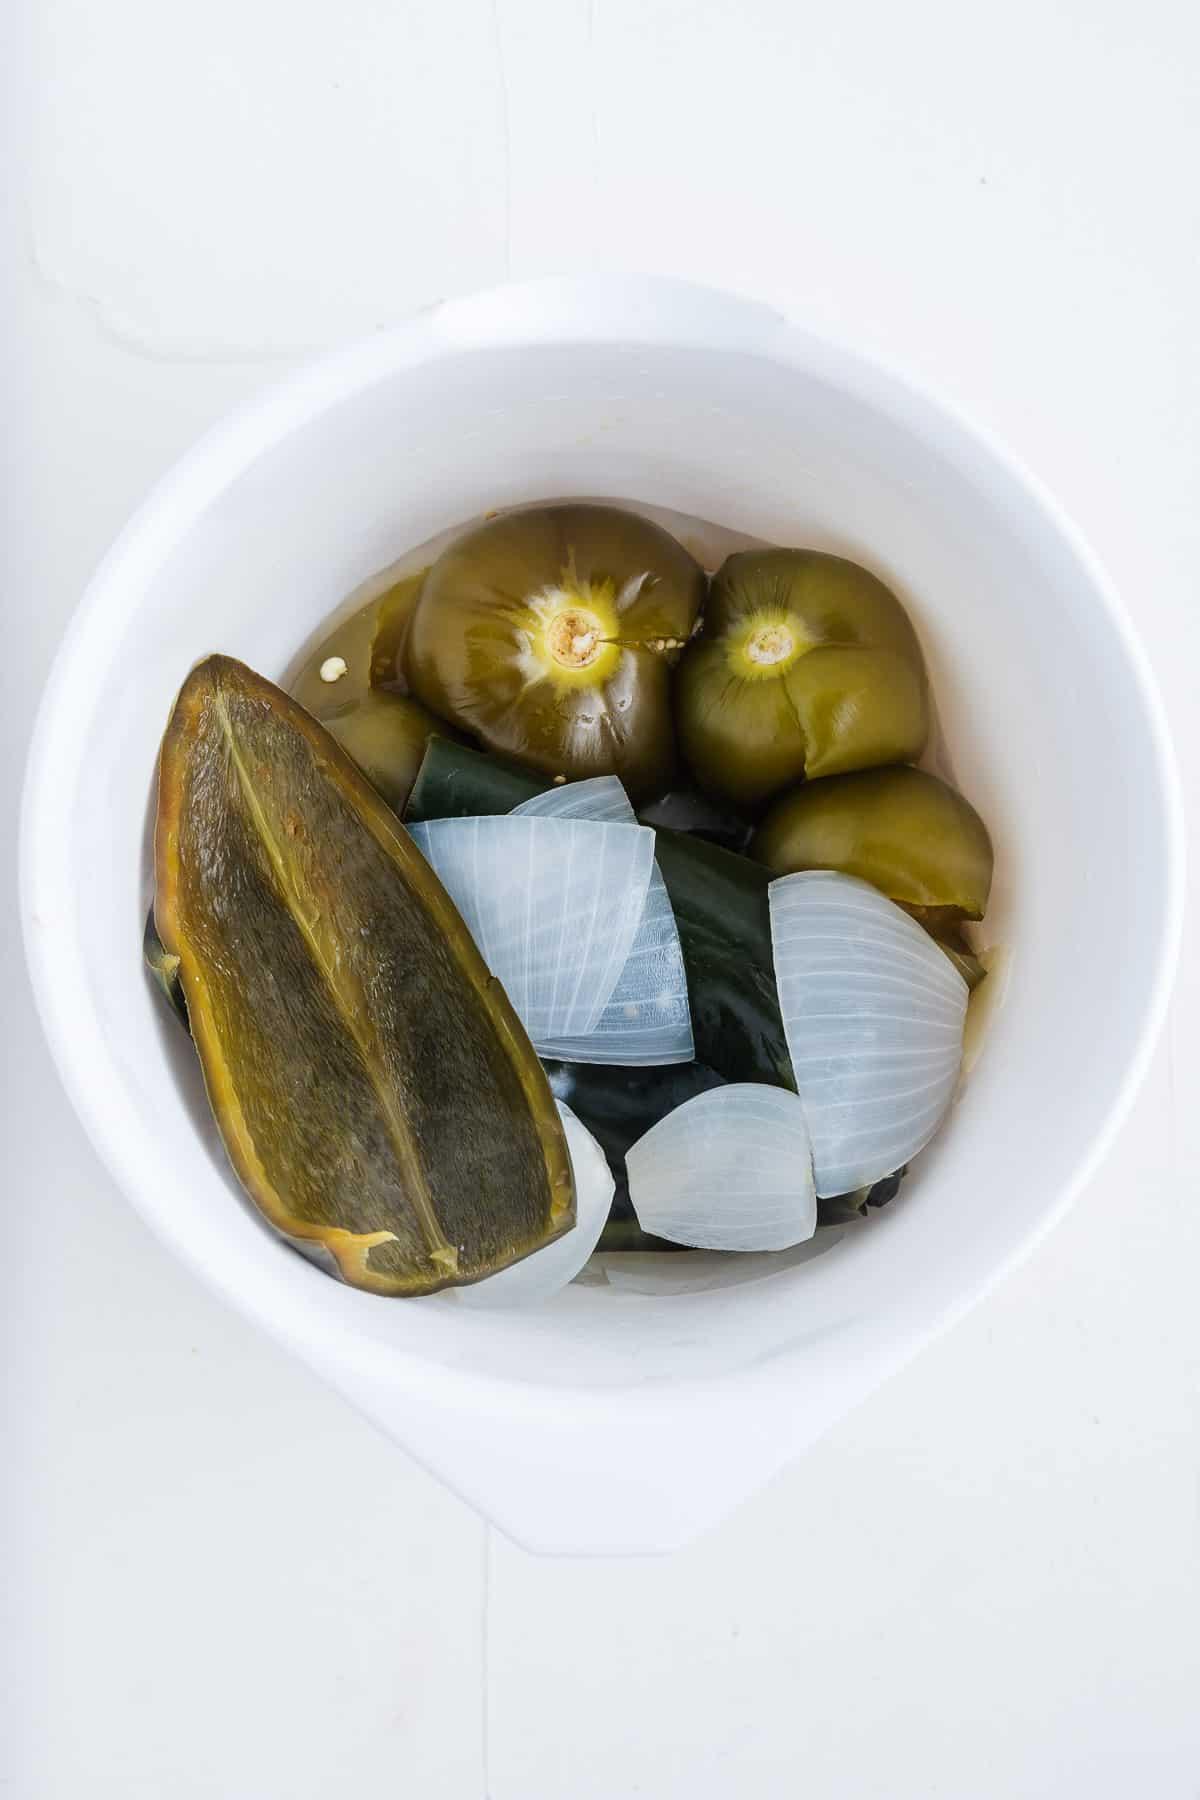 Boiled Green Chiles, Onion, Tomatillos, and Garlic